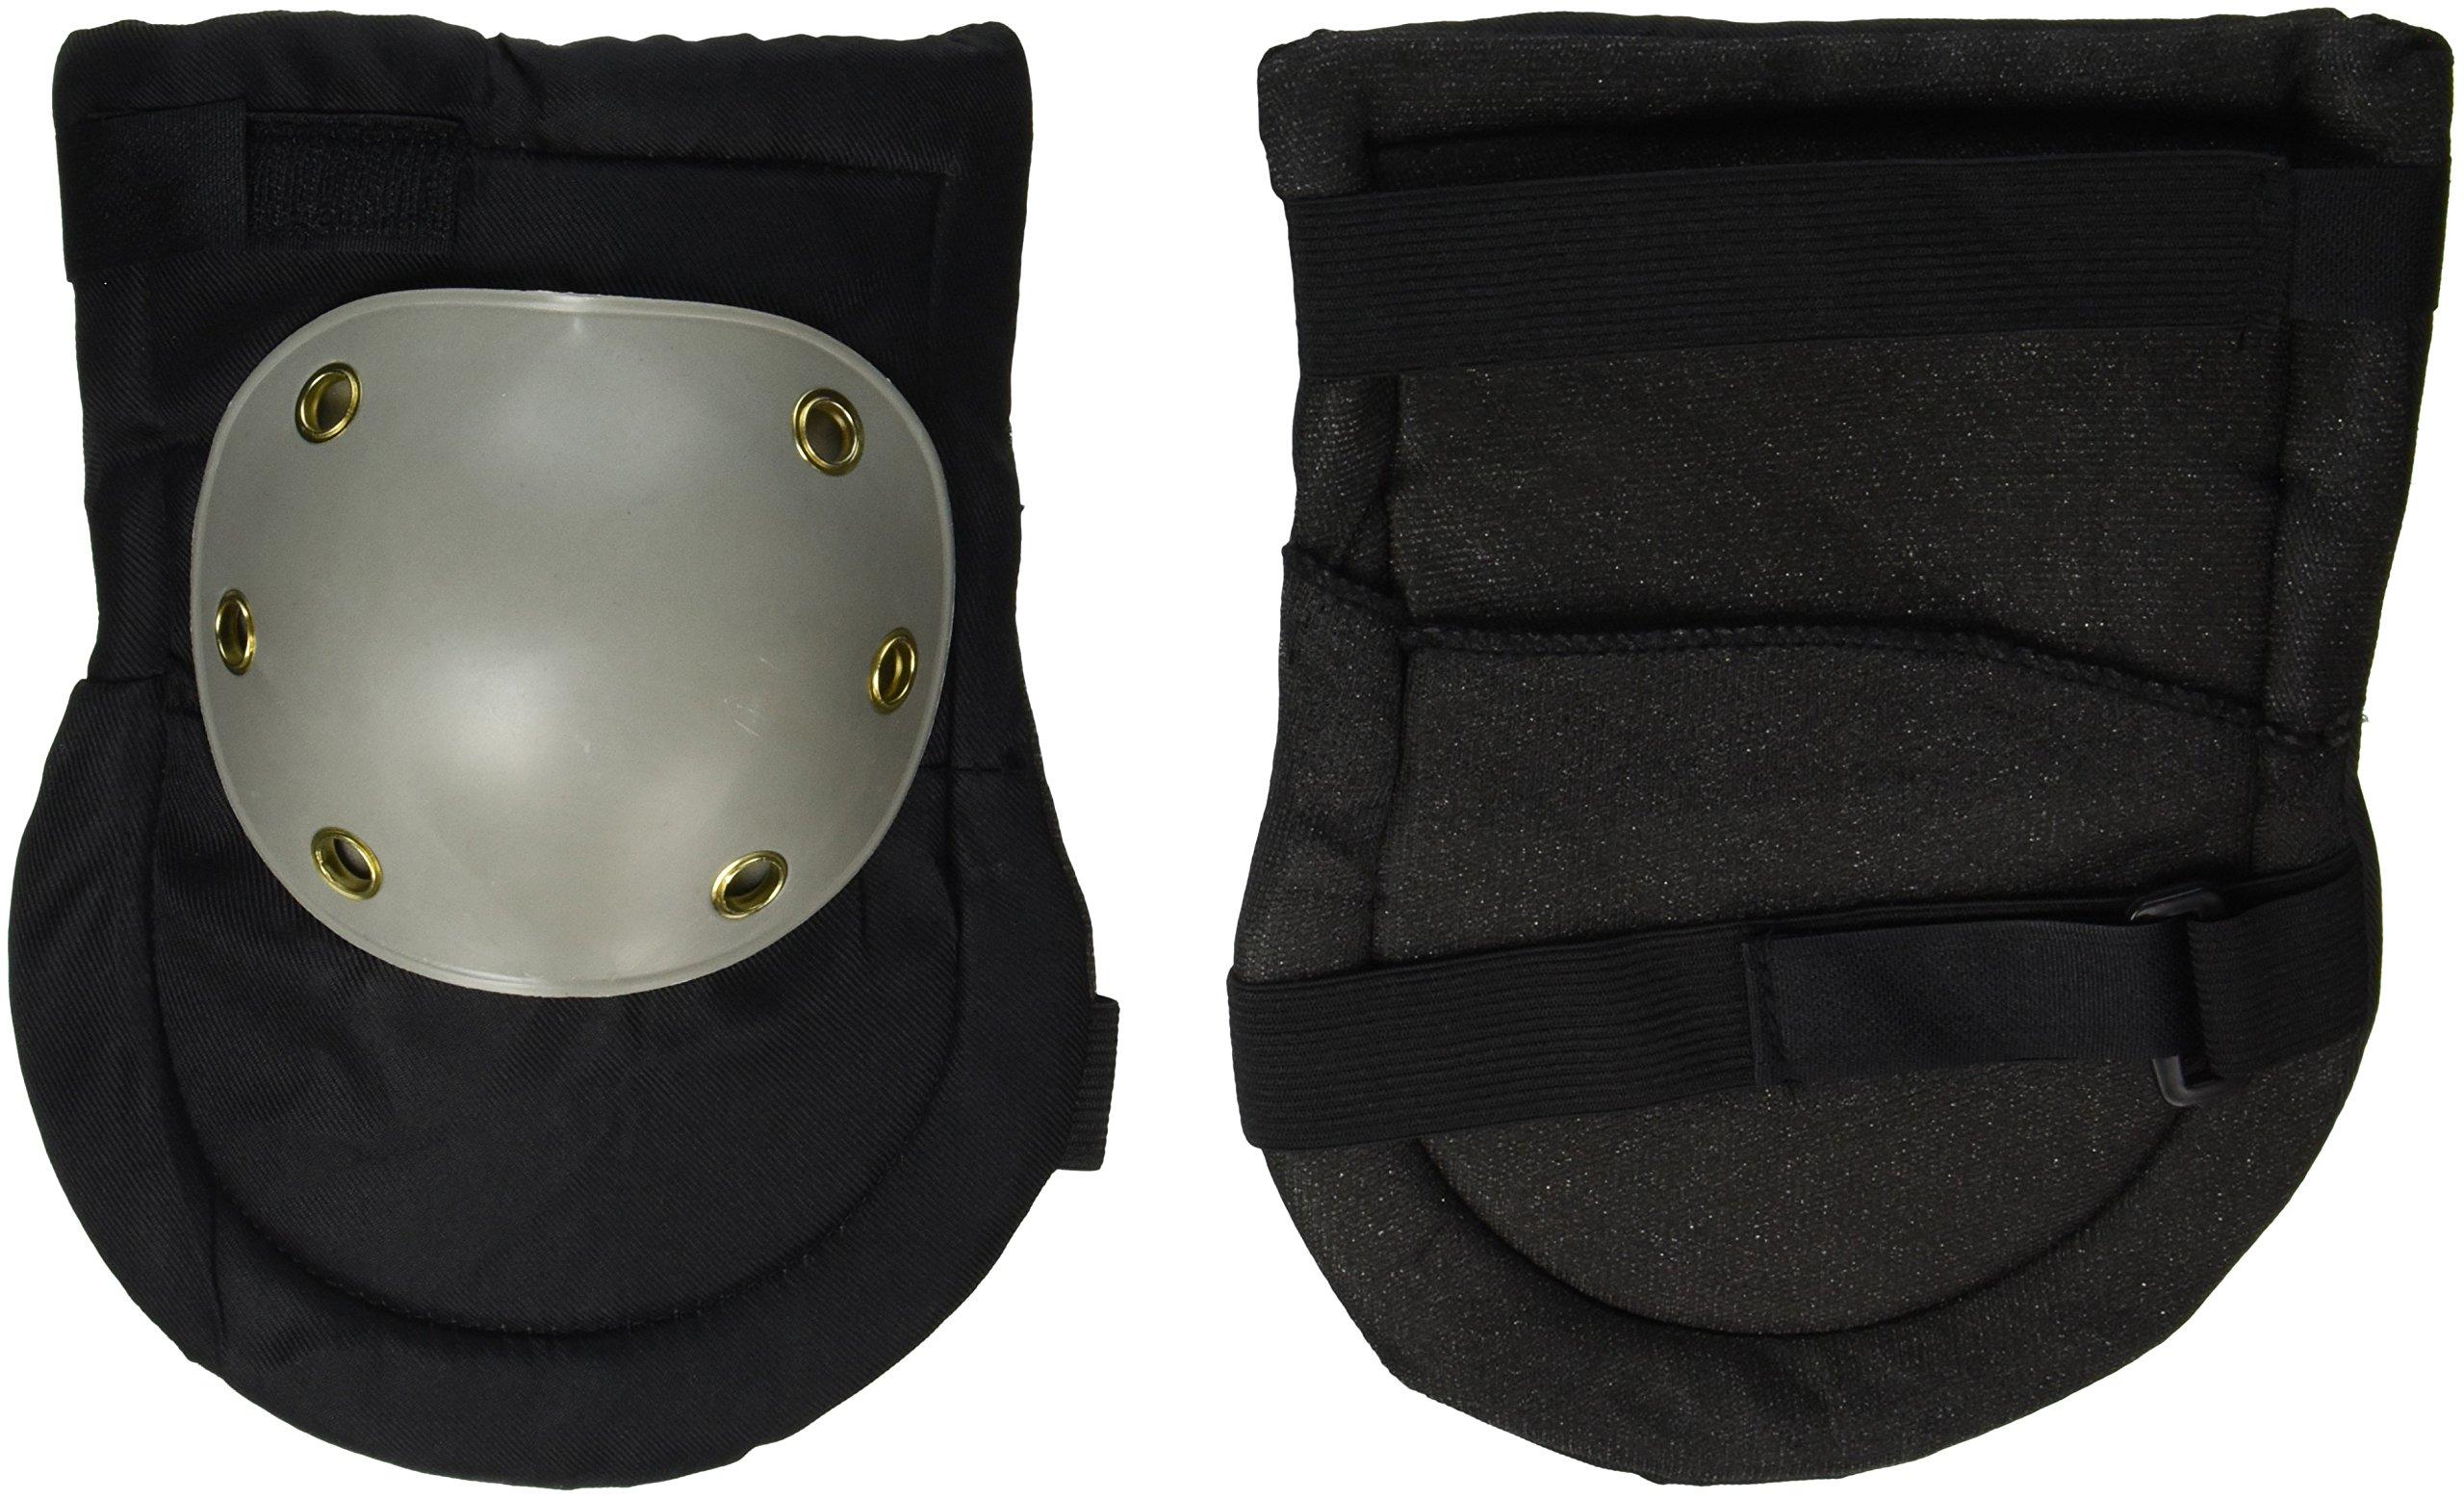 SE GP322KPB Knee Pads with Plastic Caps, Black and Grey (2 PC.)